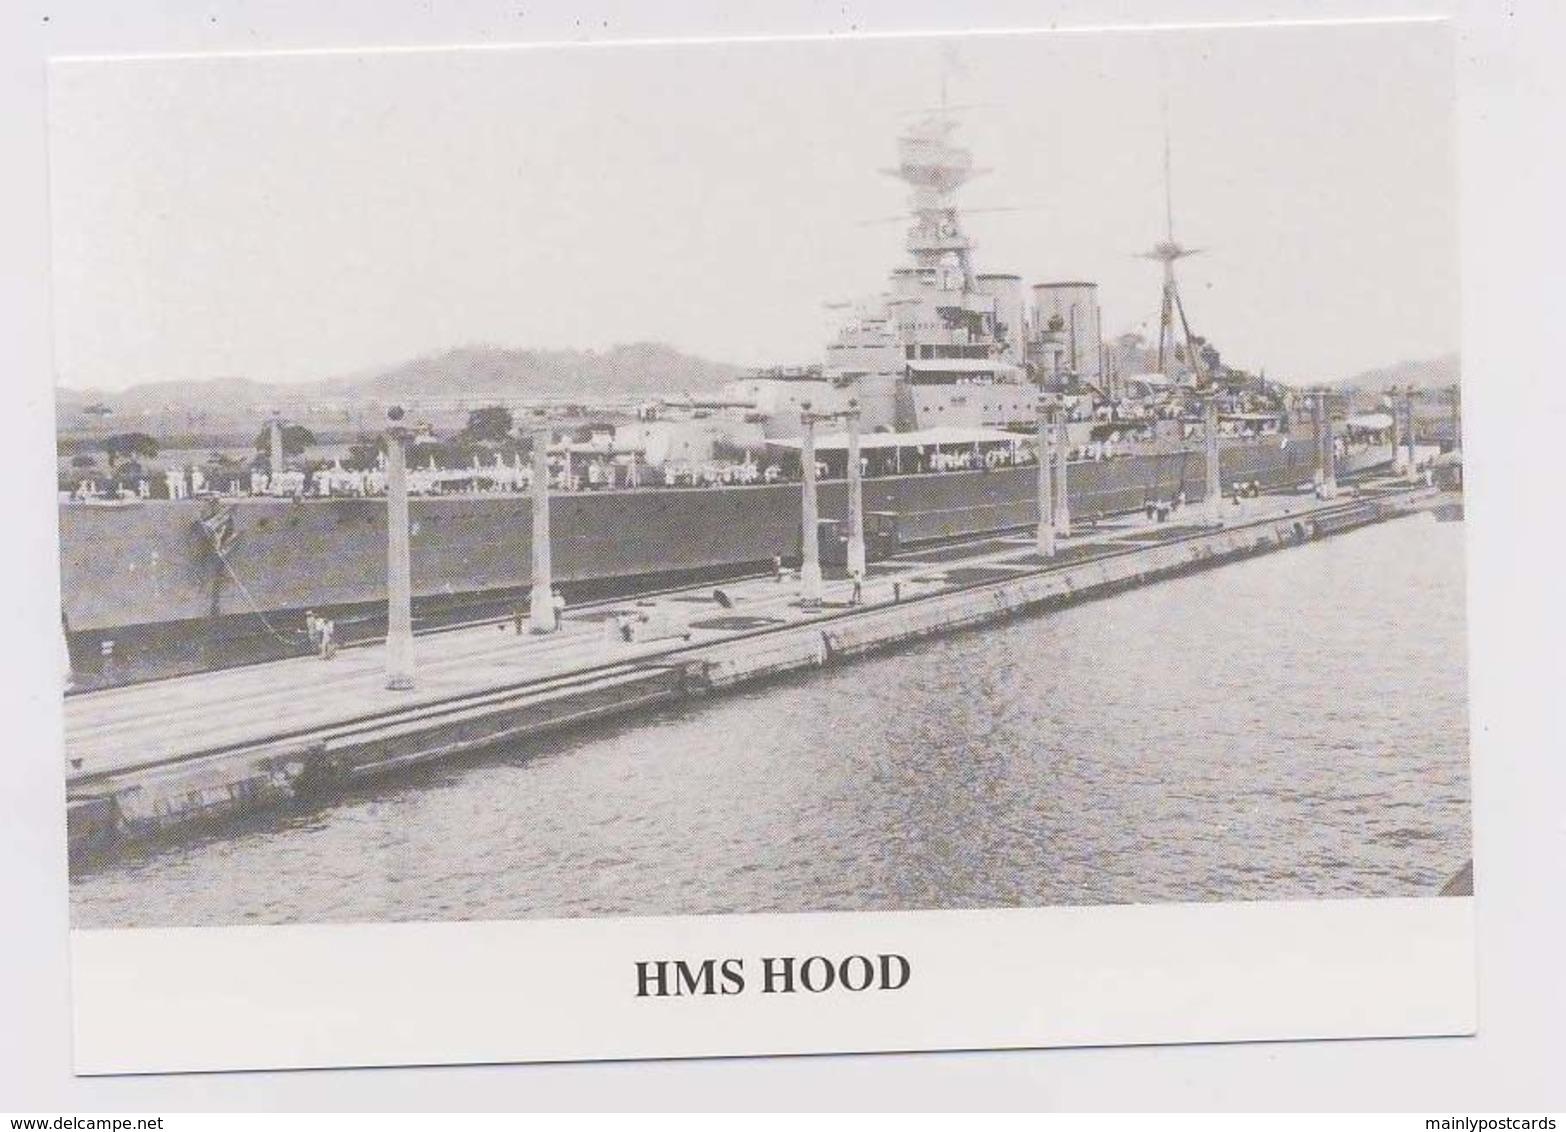 AK09 Shipping - HMS Rood - Warships